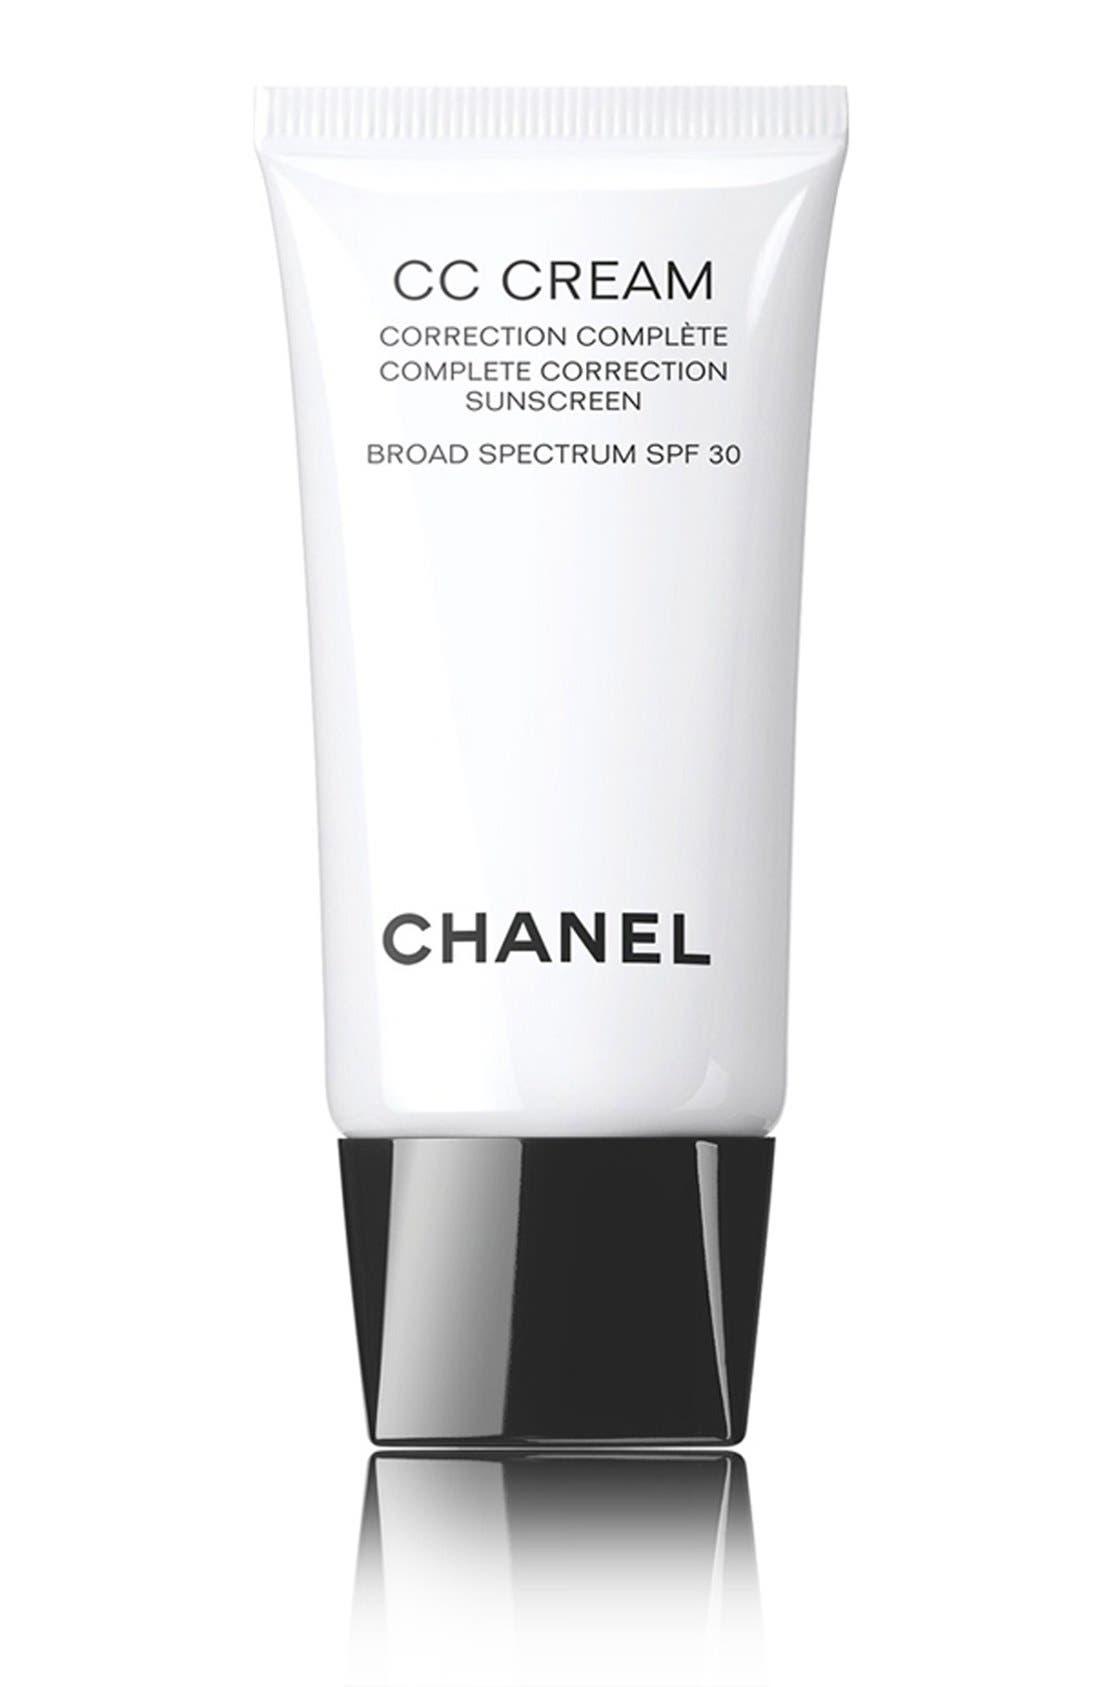 CHANEL <br />CC CREAM<br />Complete Correction Sunscreen Broad Spectrum SPF 25 - 32 Beige Rose, Main, color, 250